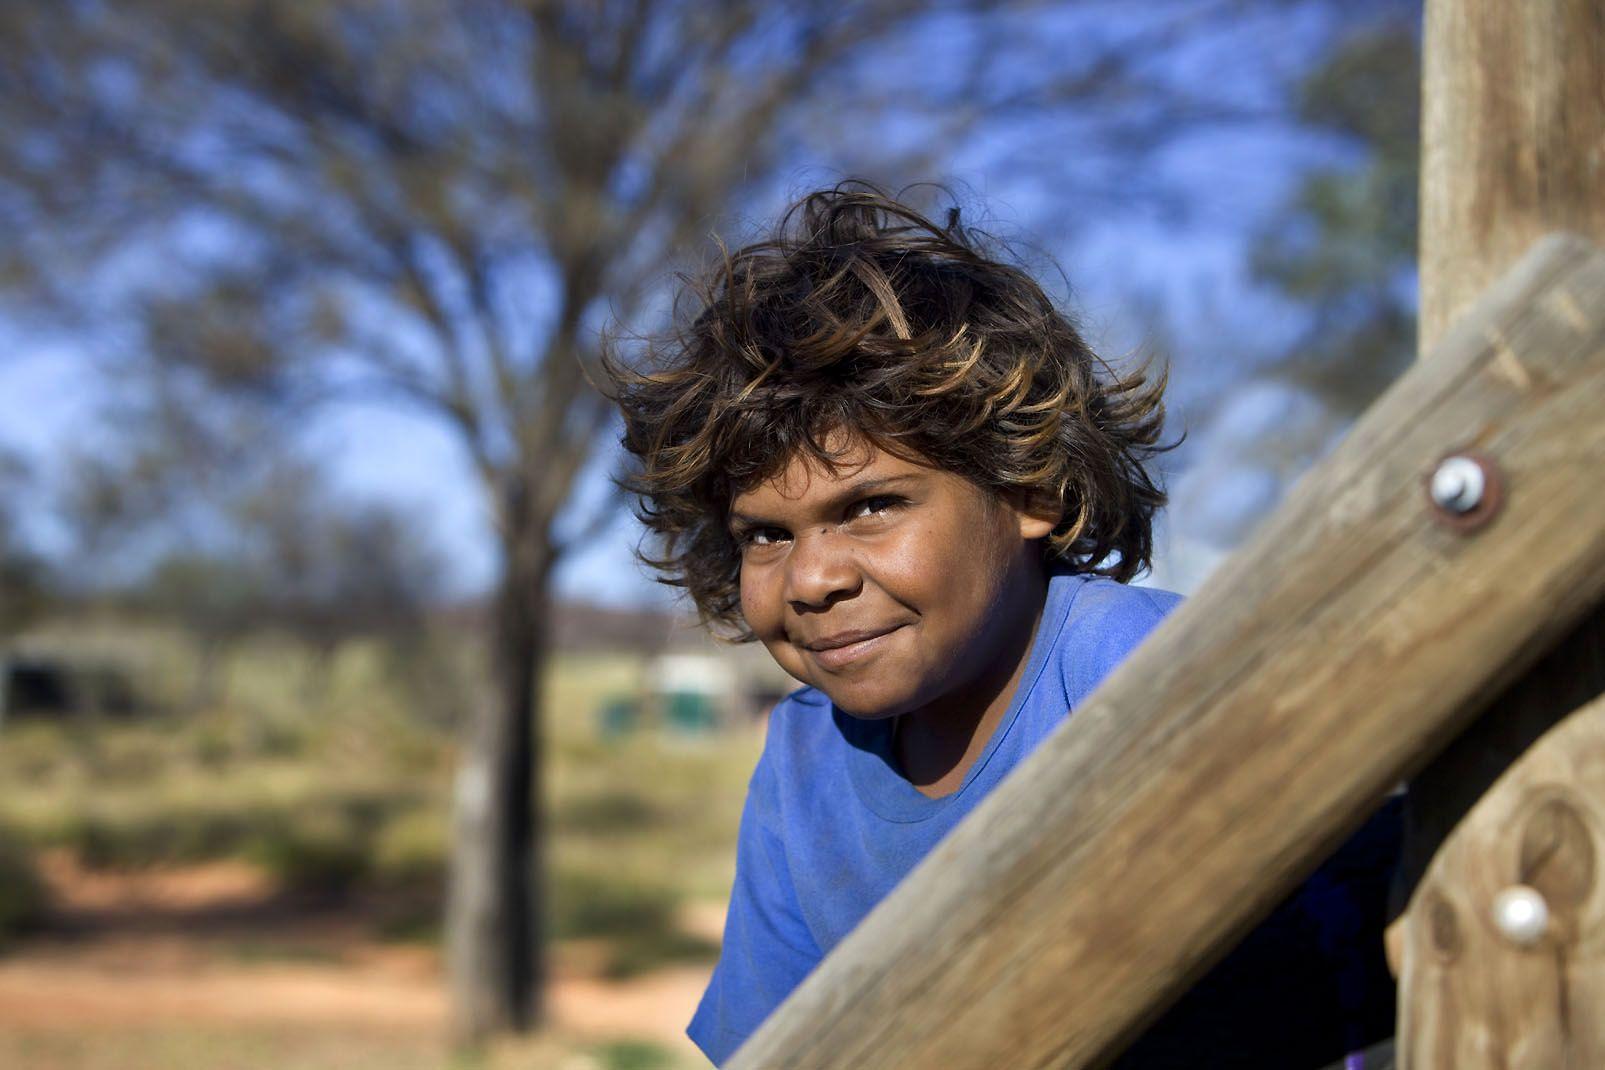 Océanie, australie, gars, aborigène